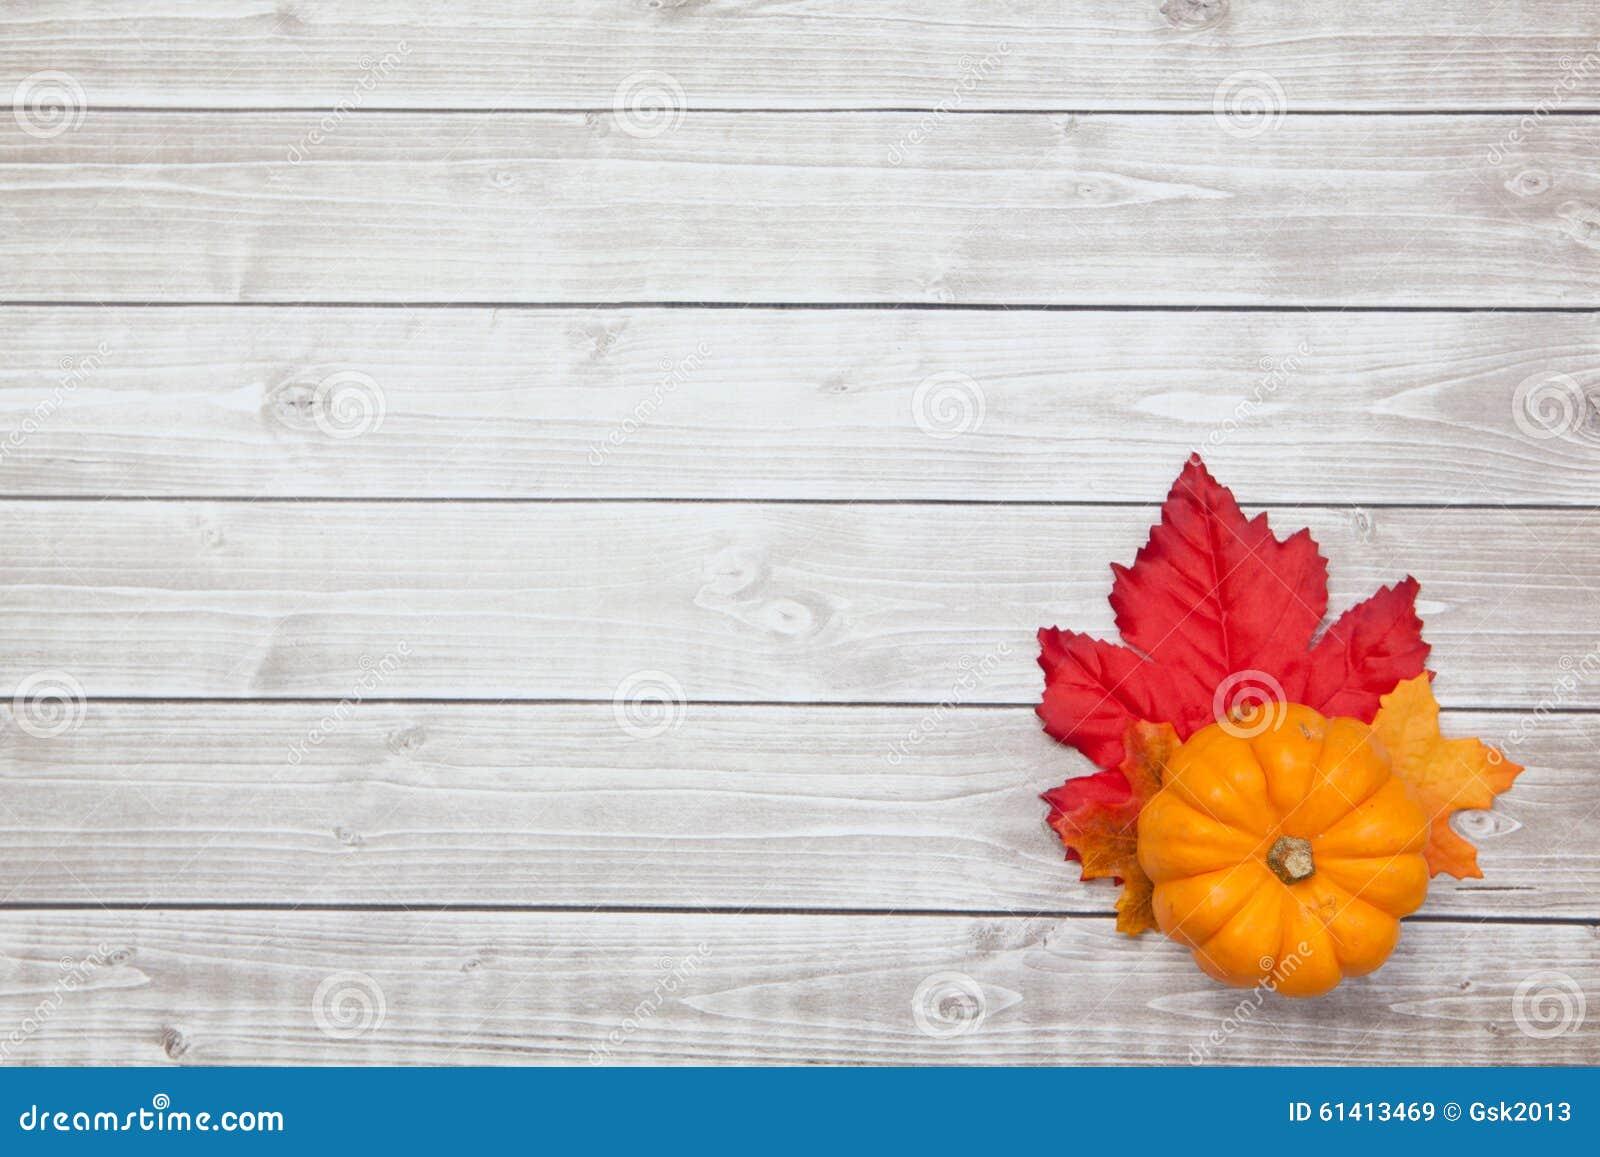 autumn thanksgiving background stock image image of orange golden